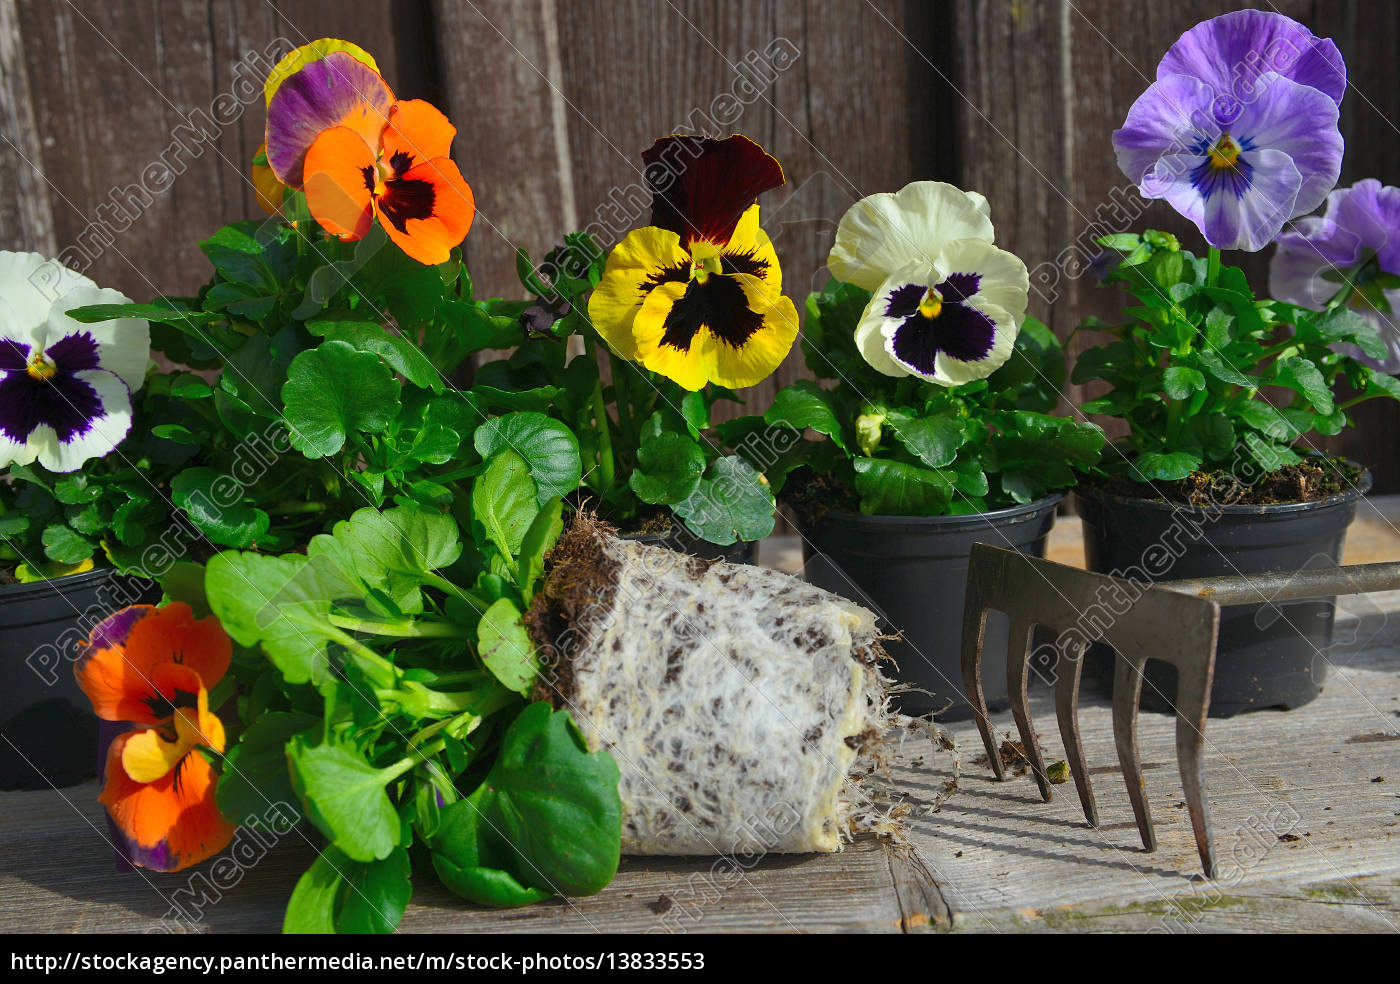 frühling blumen pflanzen - lizenzfreies bild - #13833553